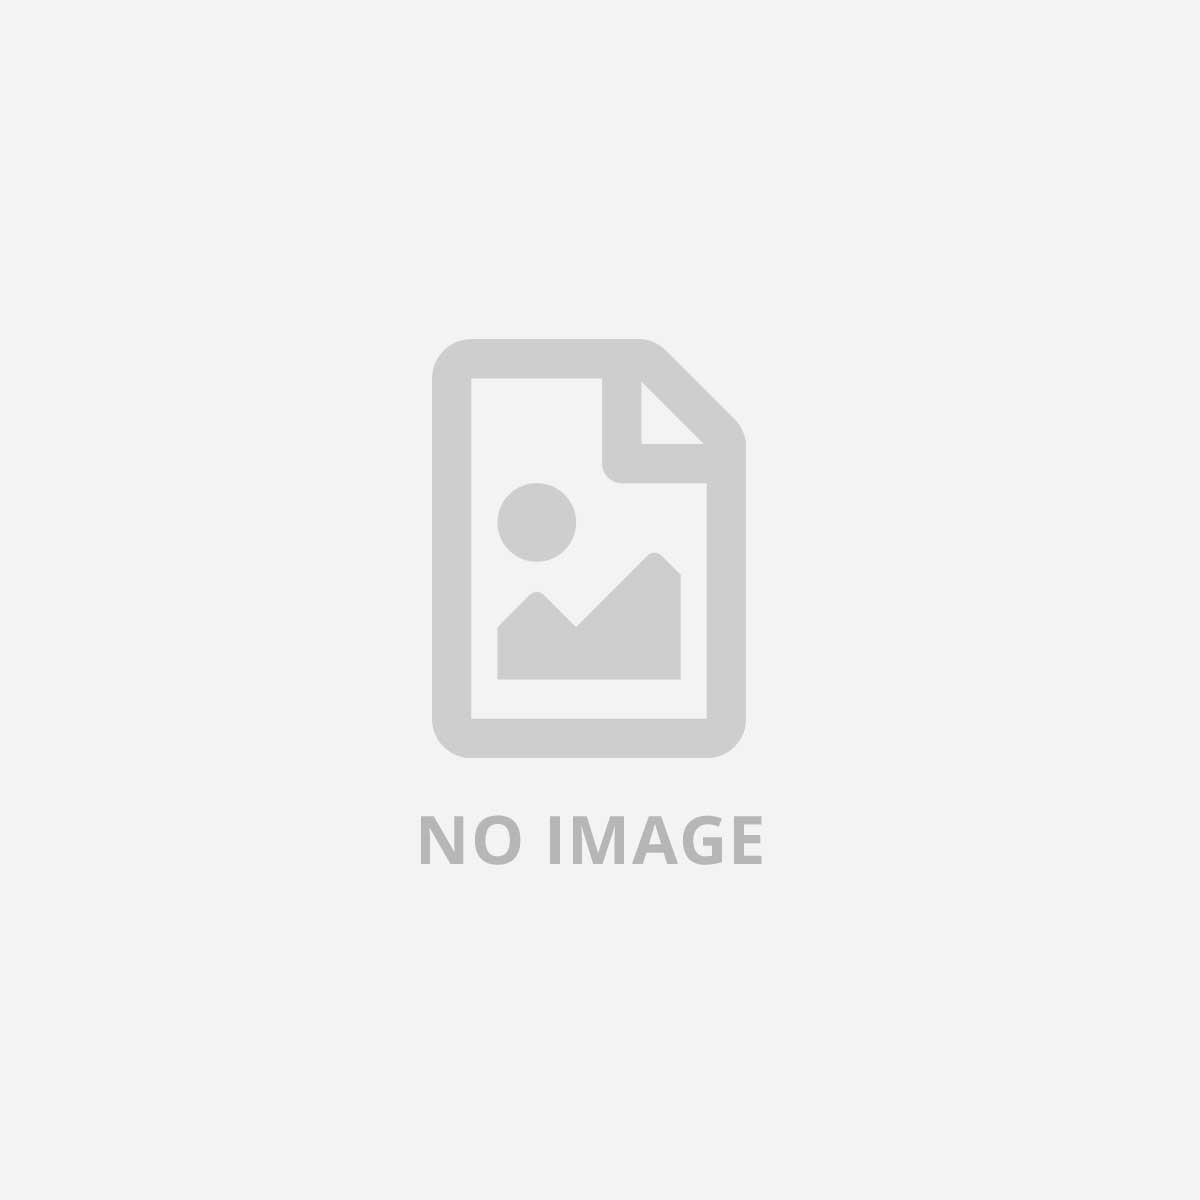 SONY REGISTRATORE DIGITALE ICD-PX370